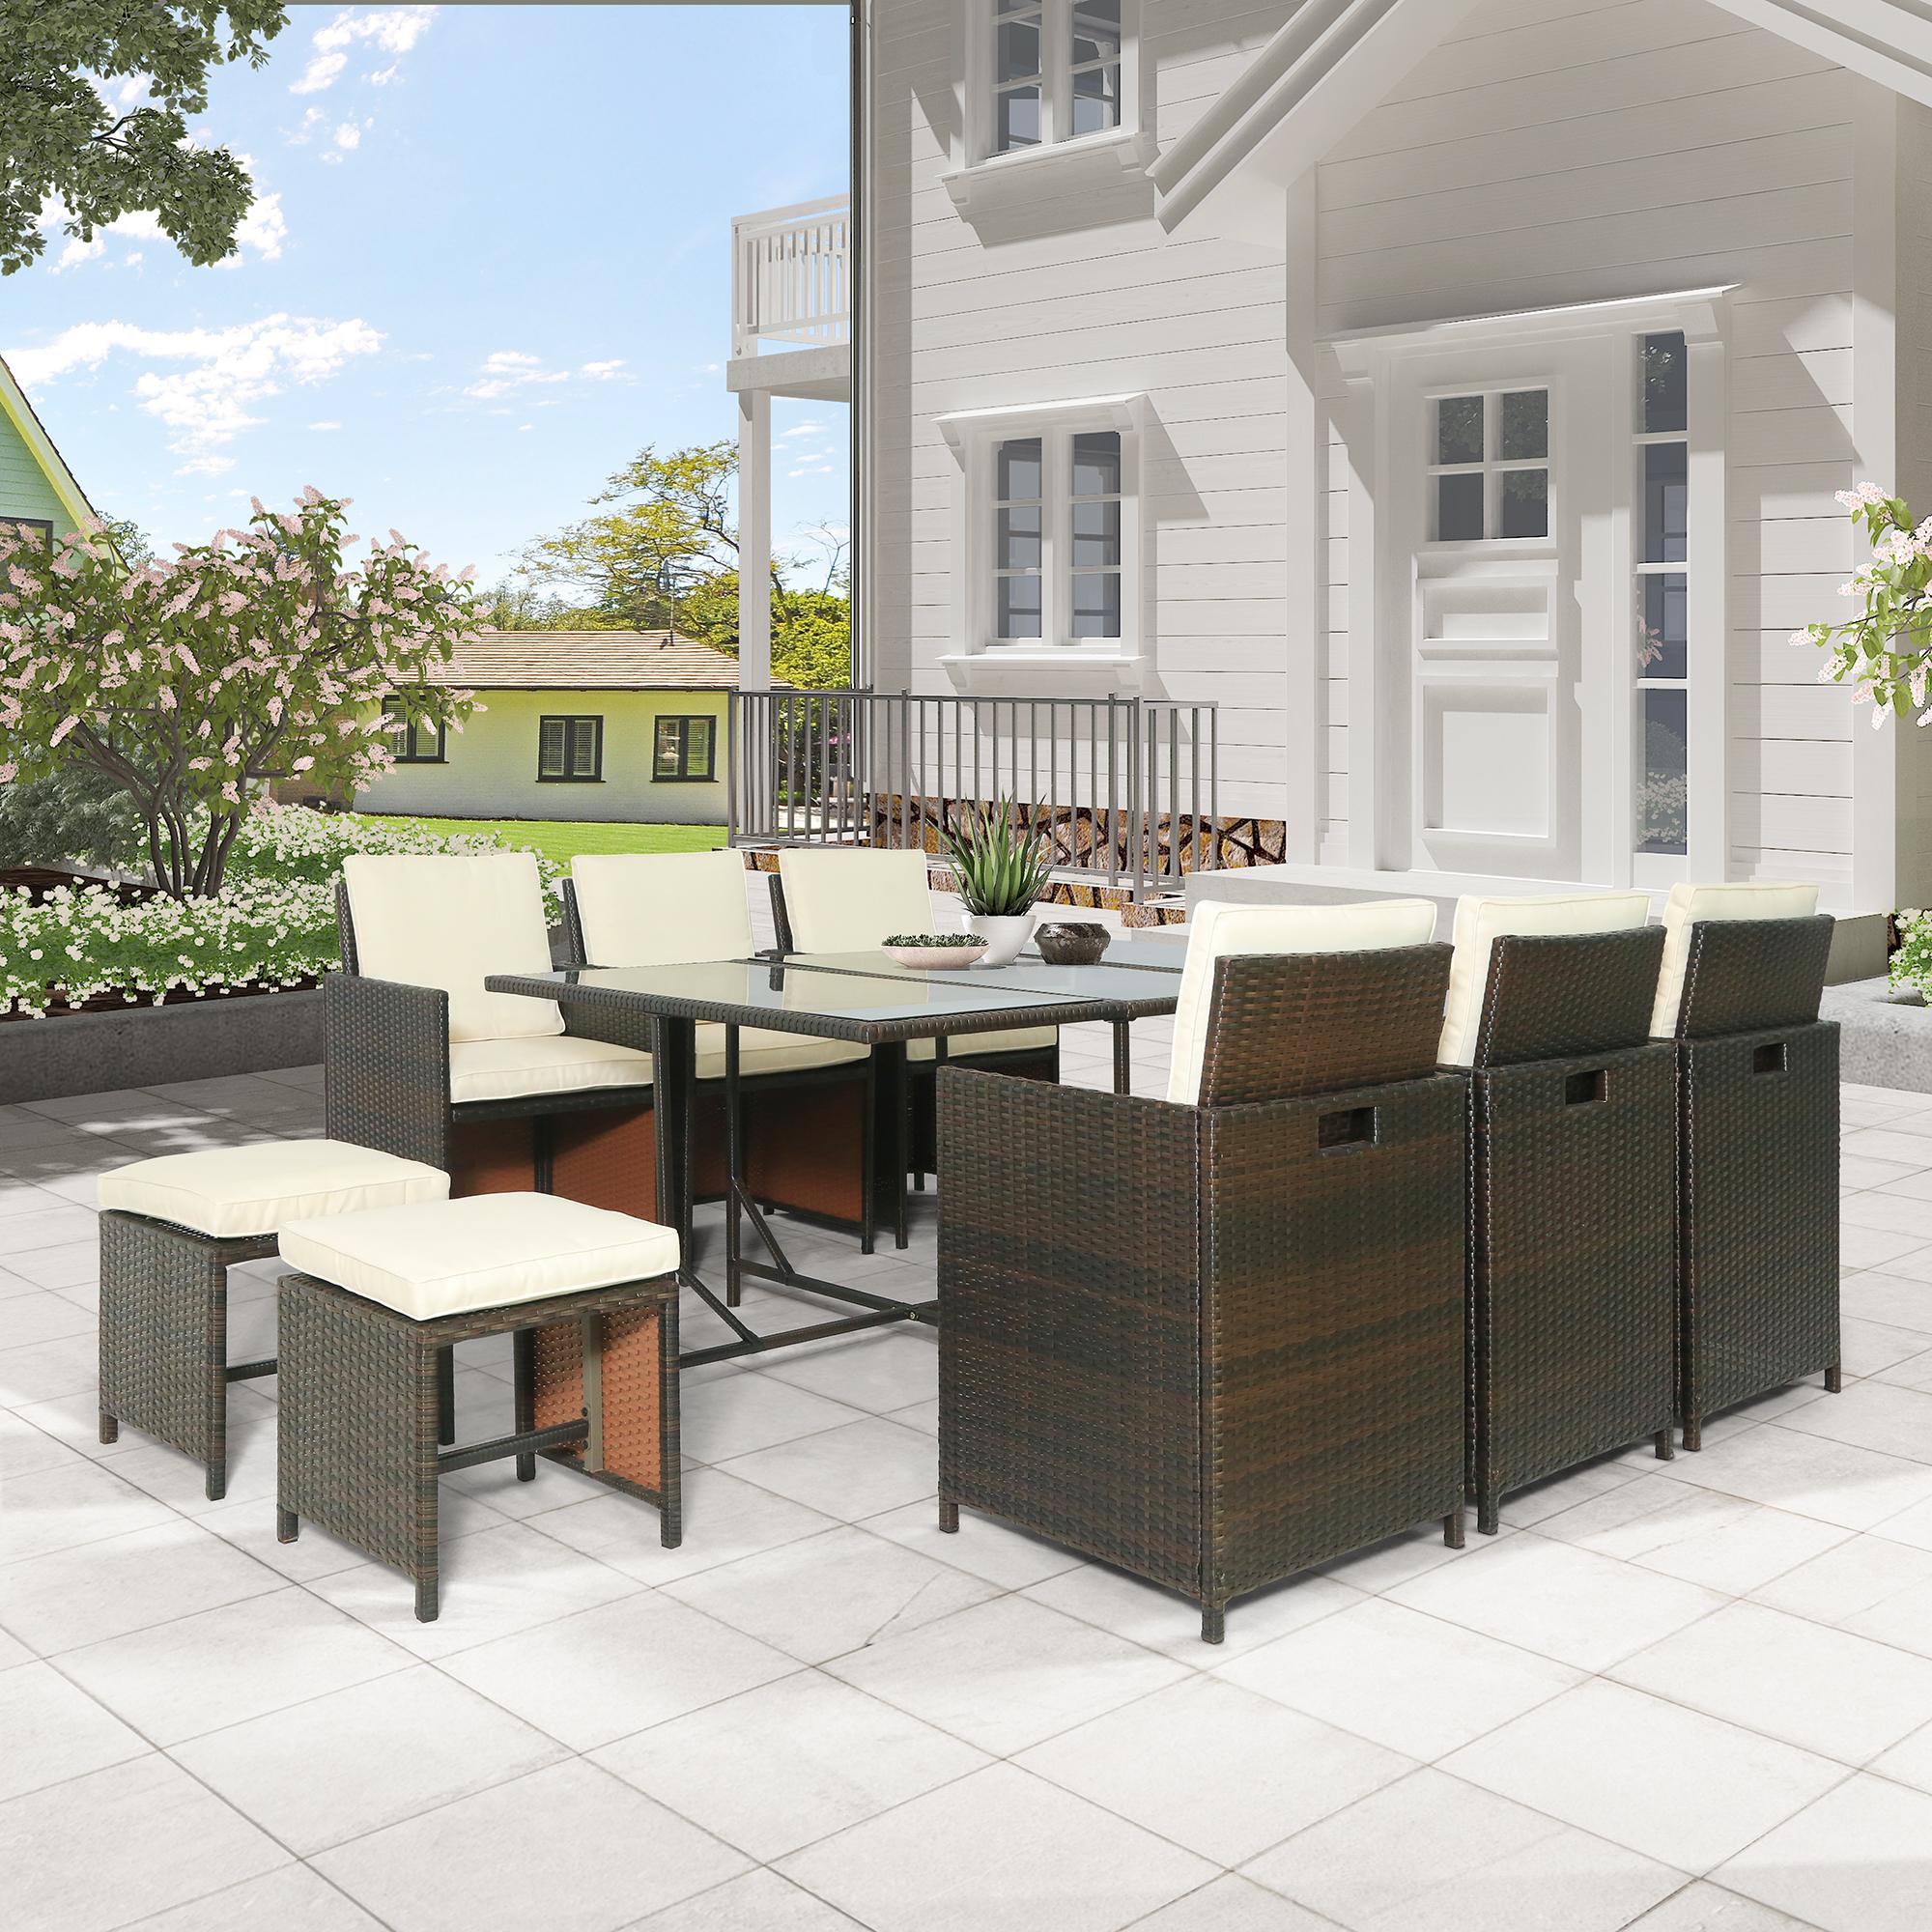 11-piece Outdoor Rattan Wicker Patio Dining Table Set Garden Outdoor Patio Furniture Sets 11-piece